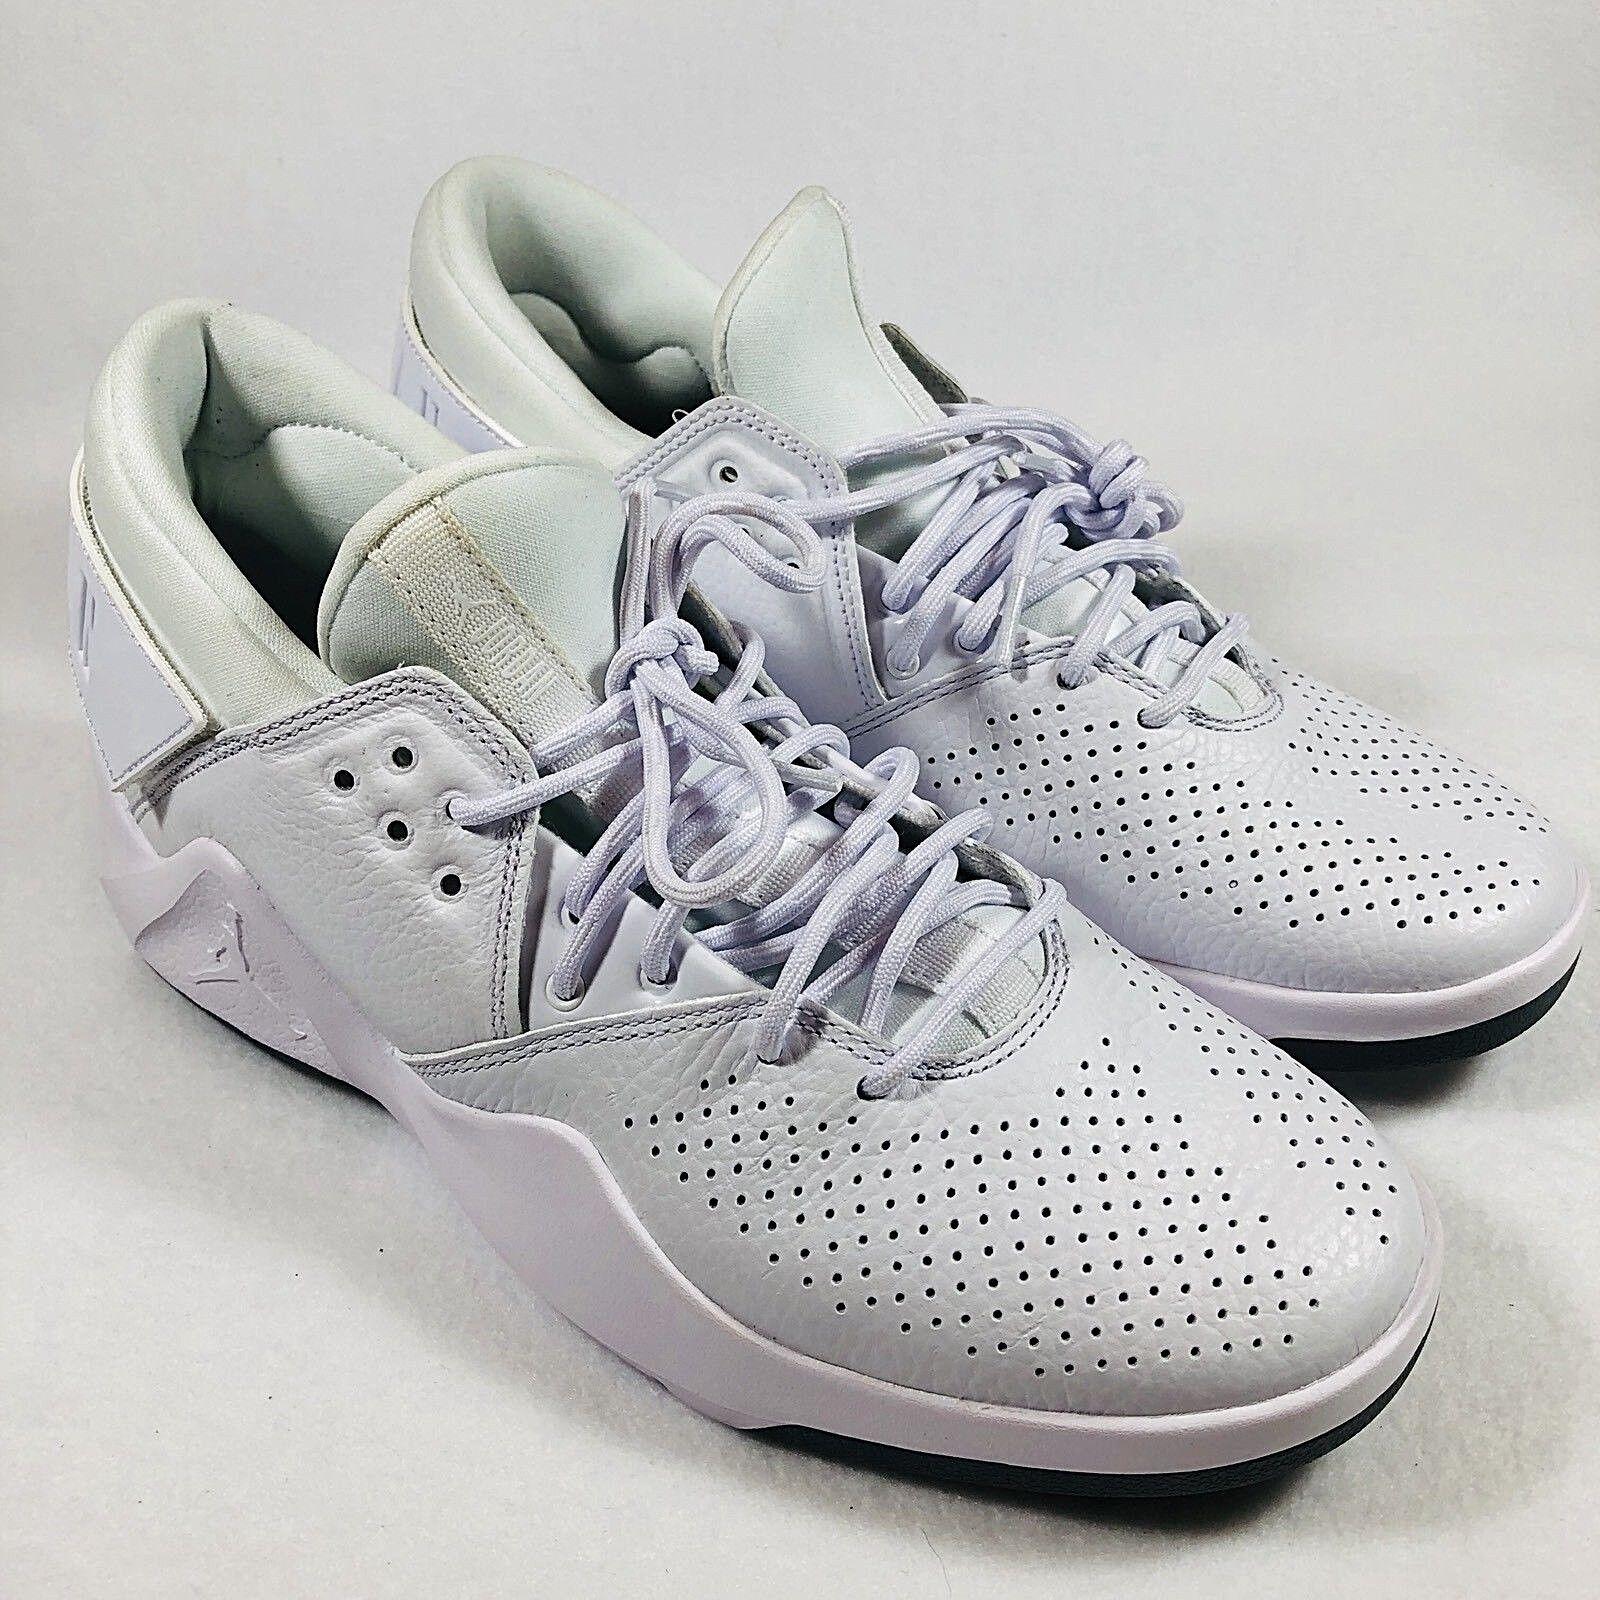 Nike Jordan Flight Fresh Premium Low Men's Basketball shoes Sz 9.5 (AH6462-100)